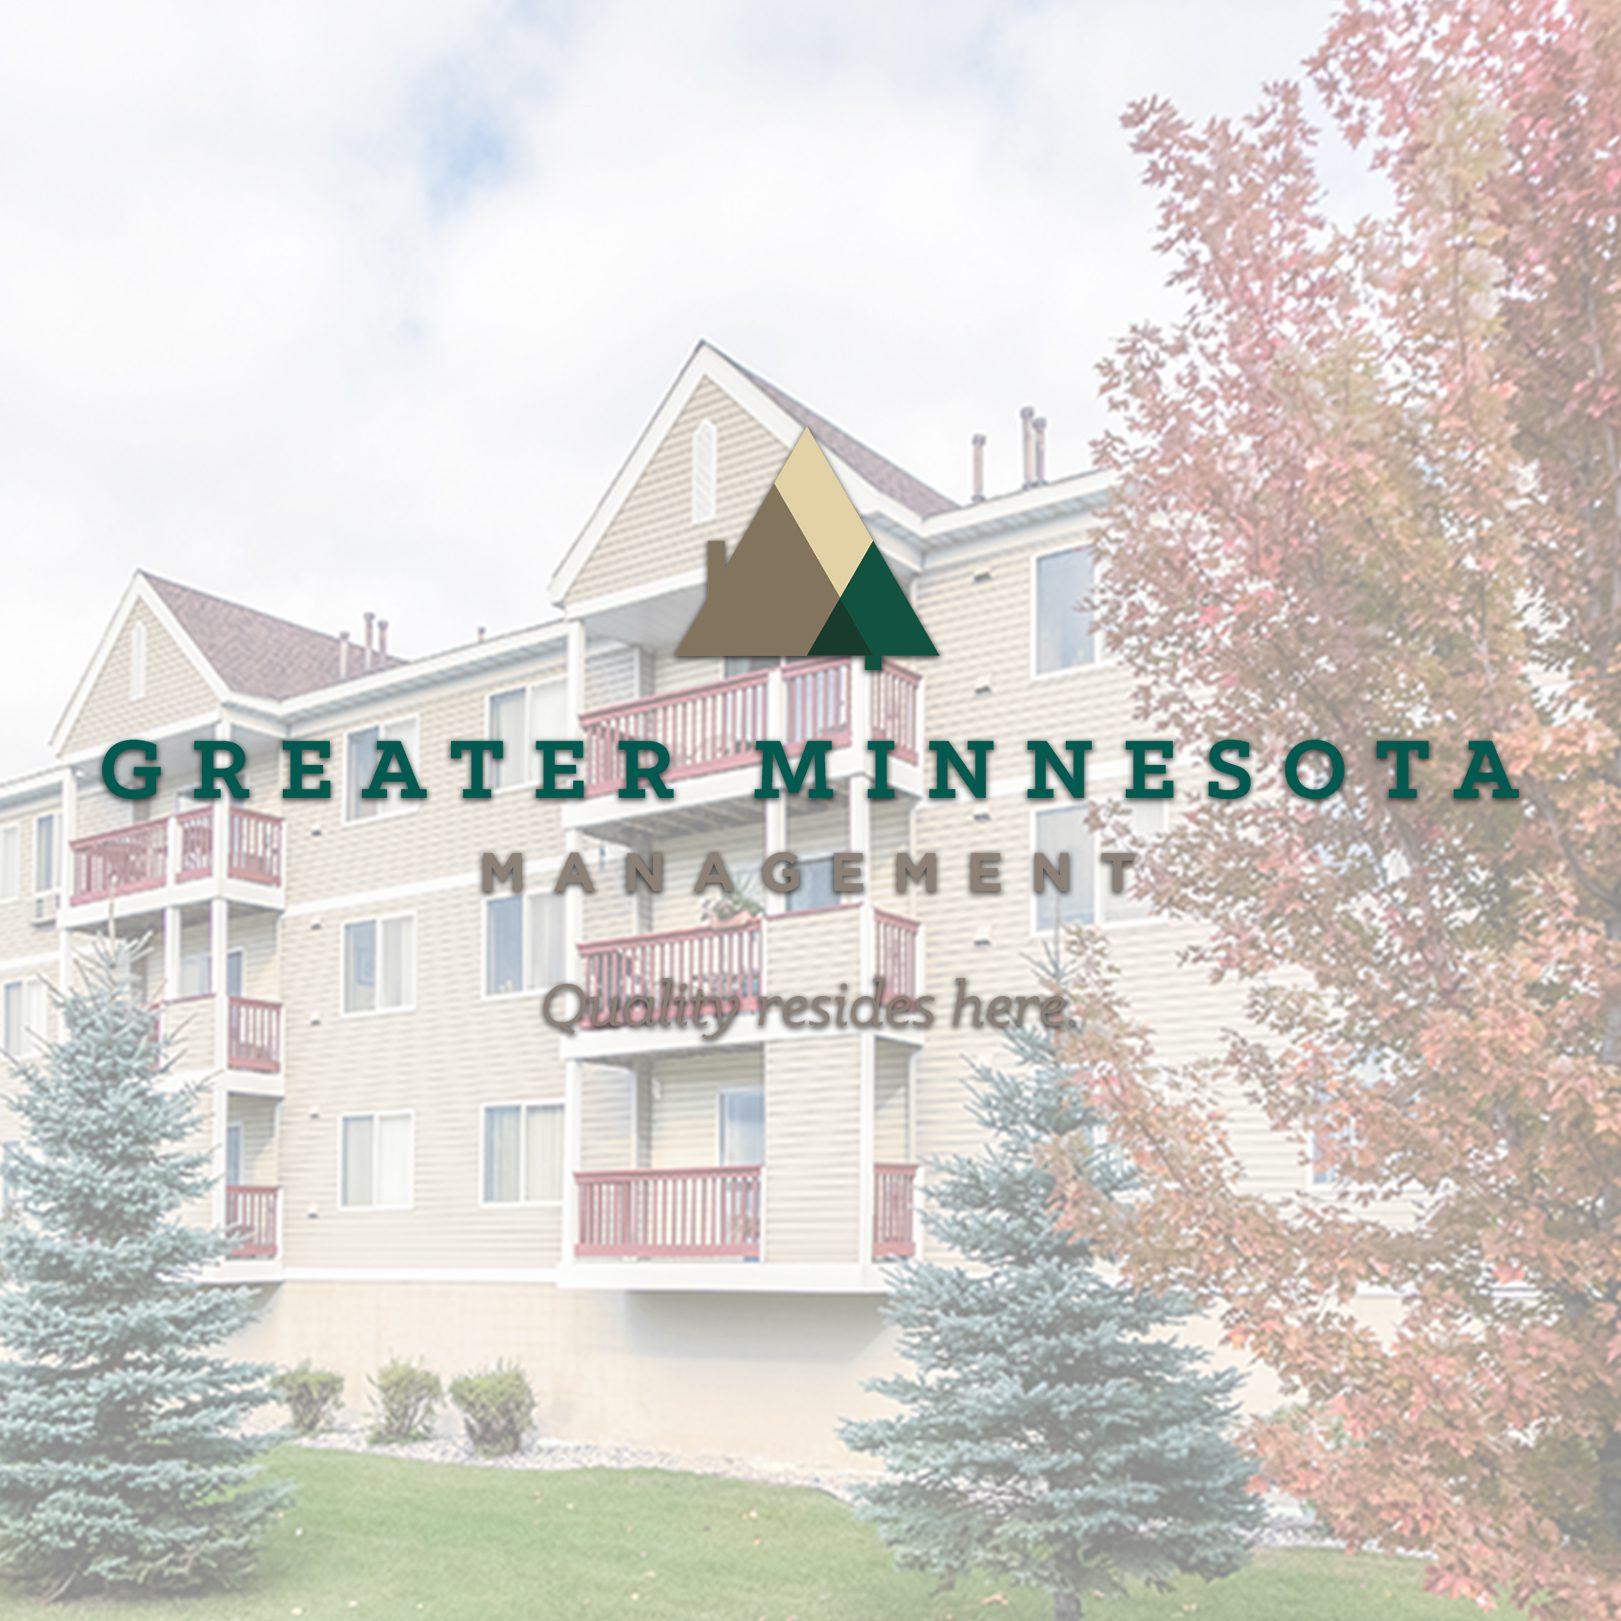 Greater Minnesota Management